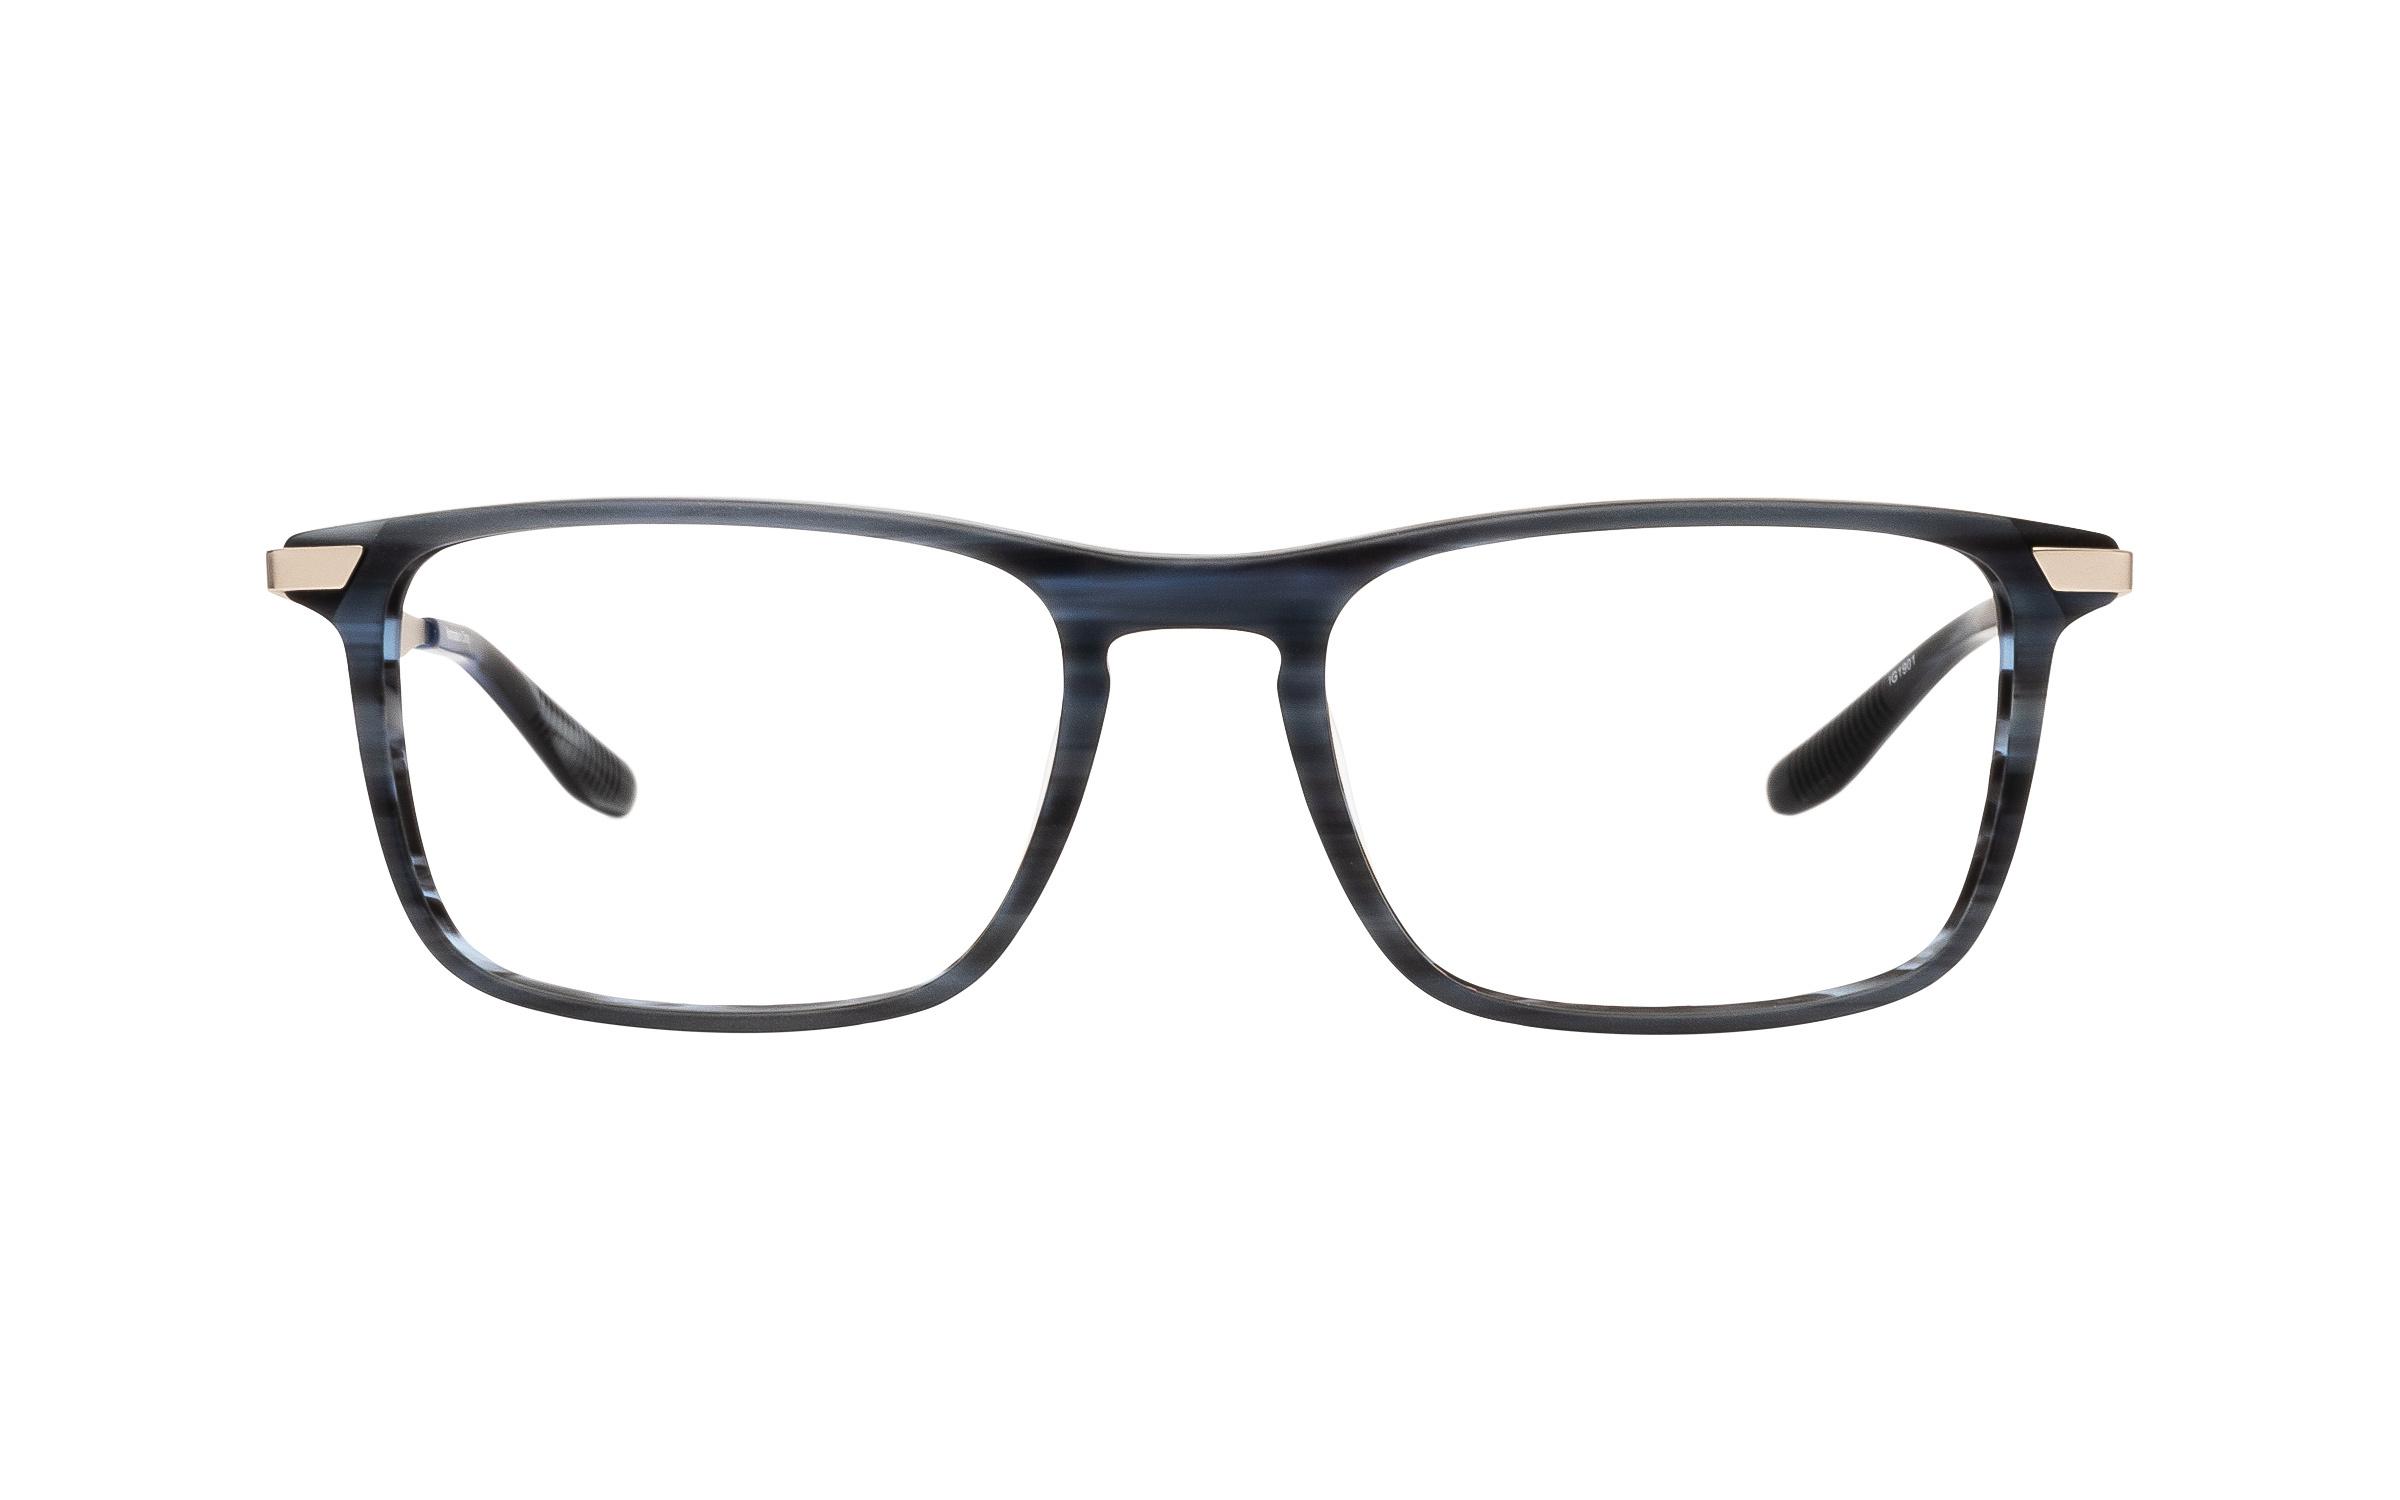 Joseph Marc Darcy (53) Eyeglasses and Frame in Matte Horn Blue | Acetate/Metal - Online Coastal